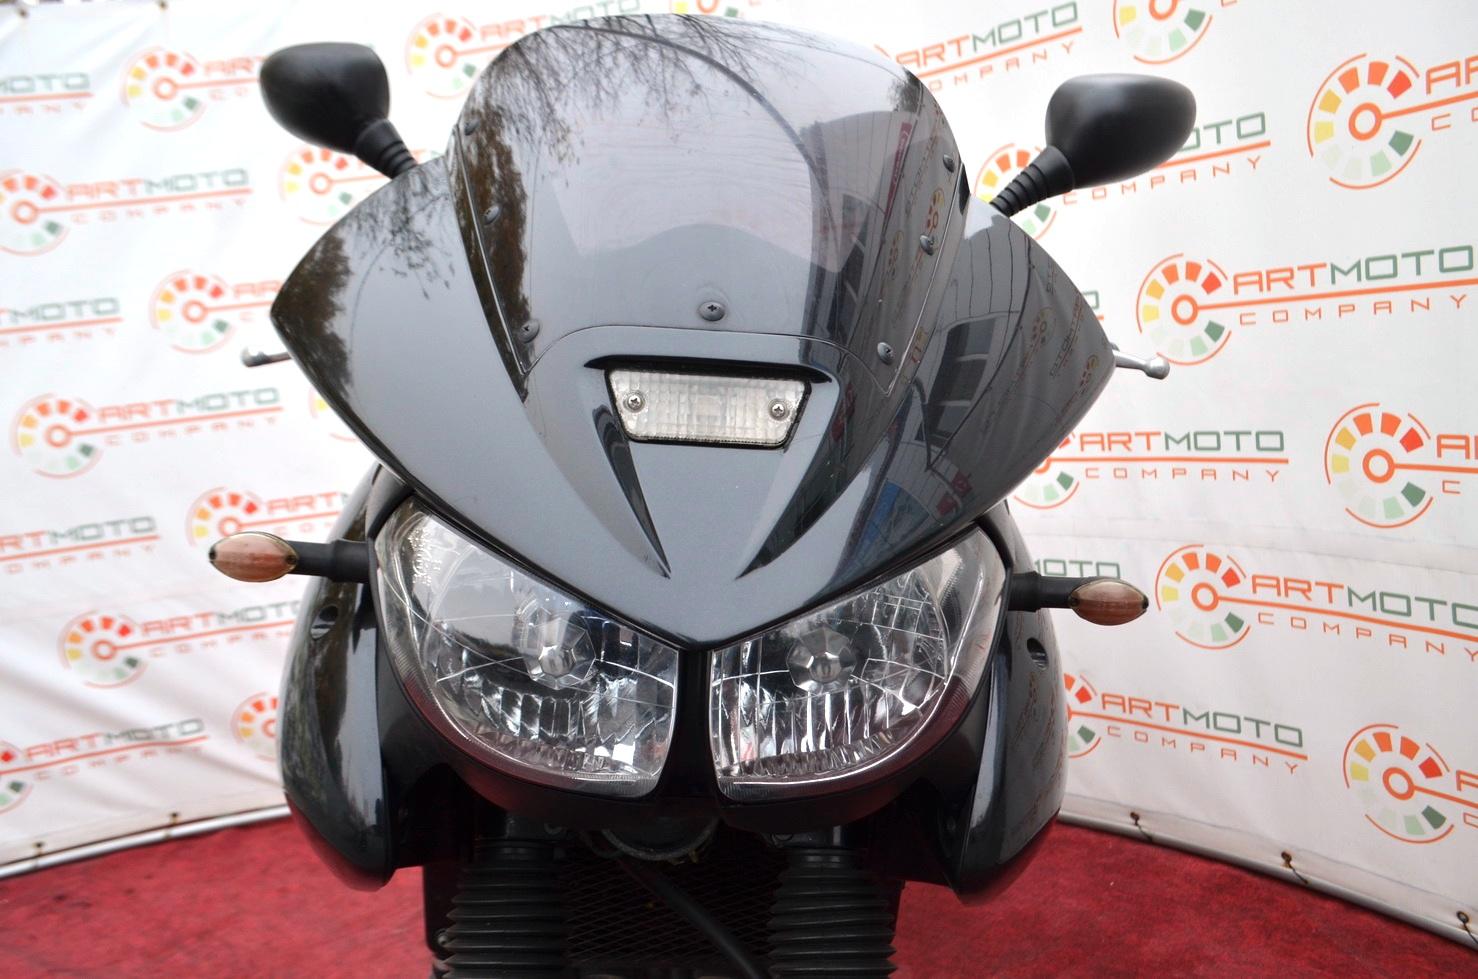 МОТОЦИКЛ YAMAHA TDM 900 2006  Артмото - купить квадроцикл в украине и харькове, мотоцикл, снегоход, скутер, мопед, электромобиль